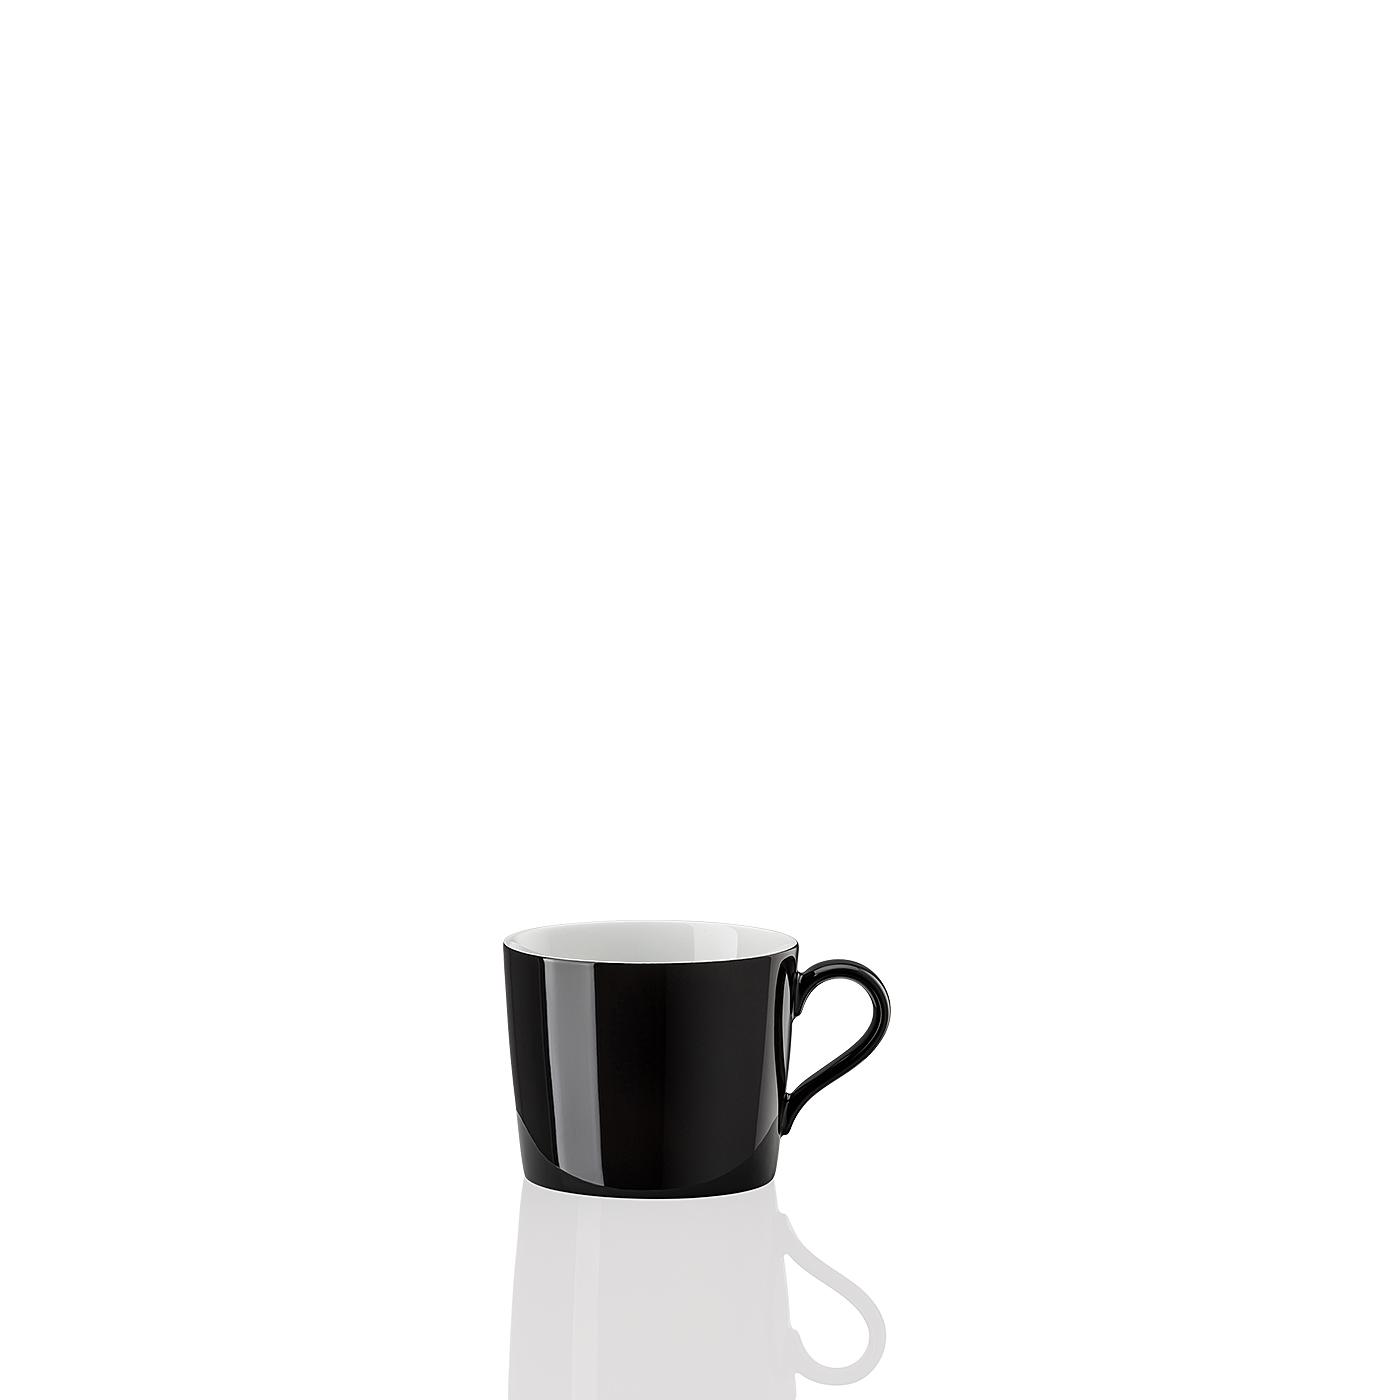 Kaffee-Obertasse Tric Monochrome Arzberg